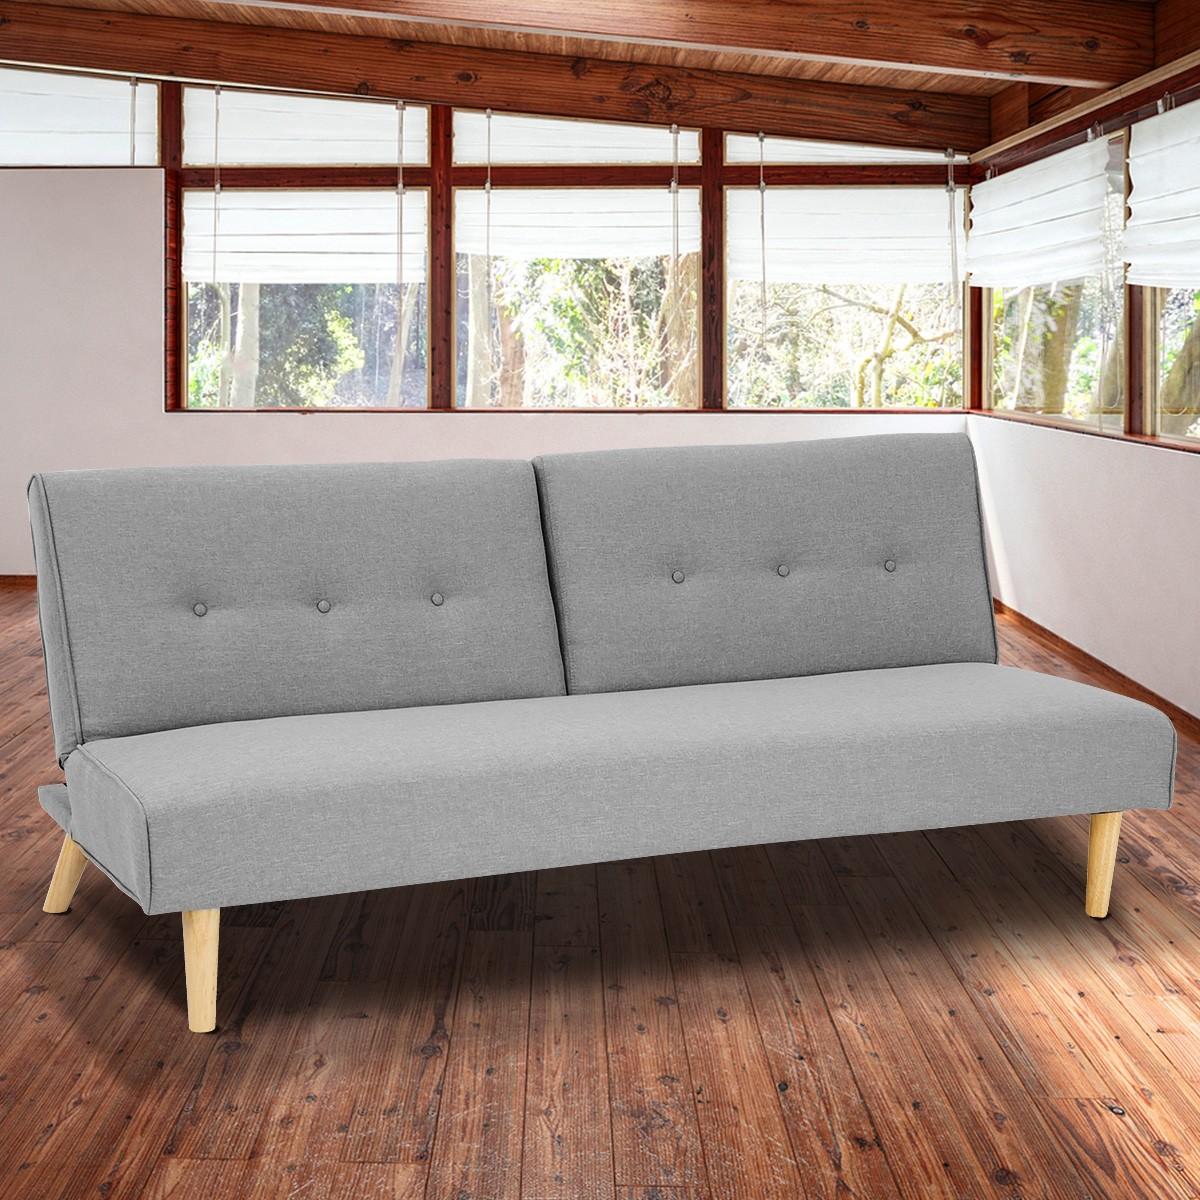 Soho 3 Modular Linen Fabric Sofa Bed Couch Lounge Futon - Light Grey